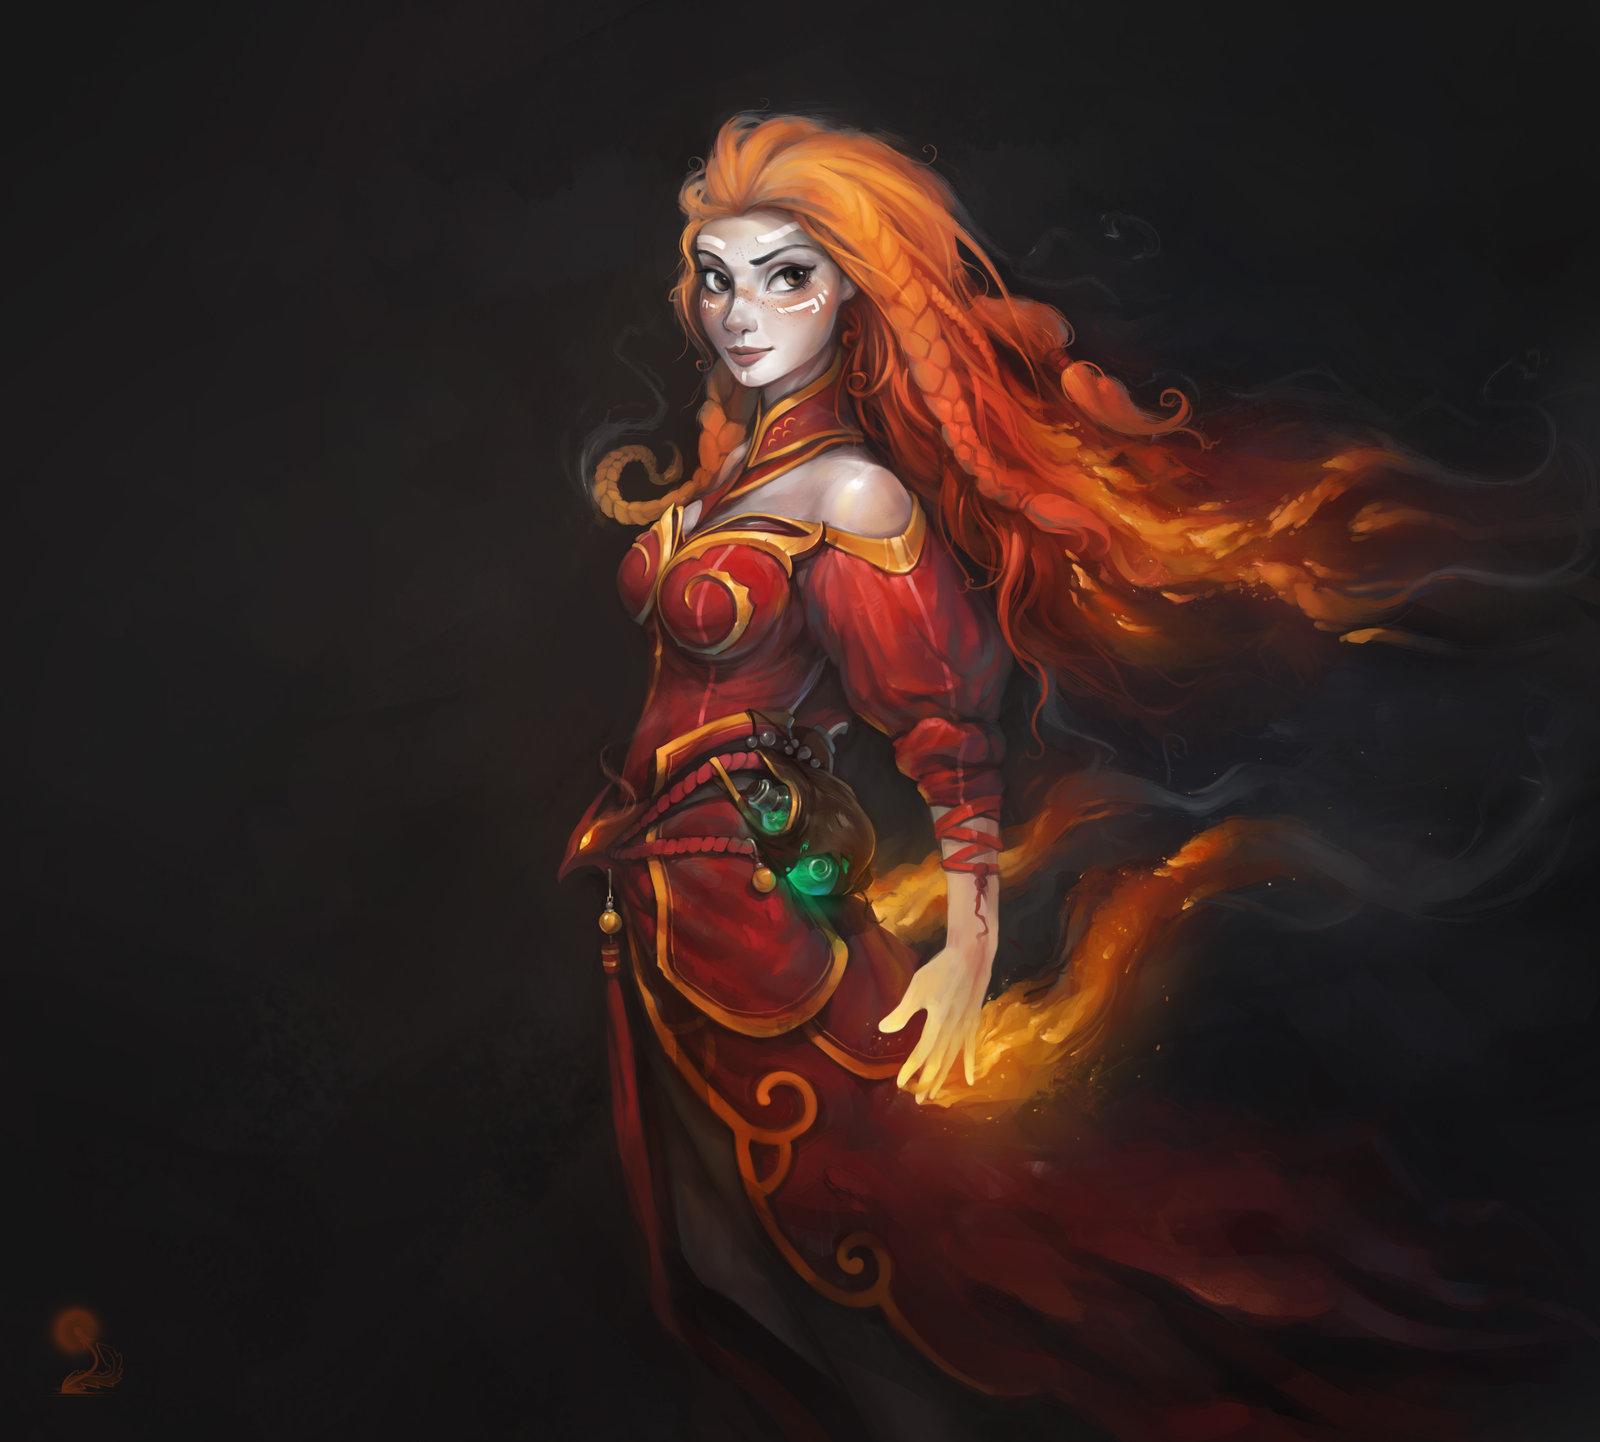 Lina Invers